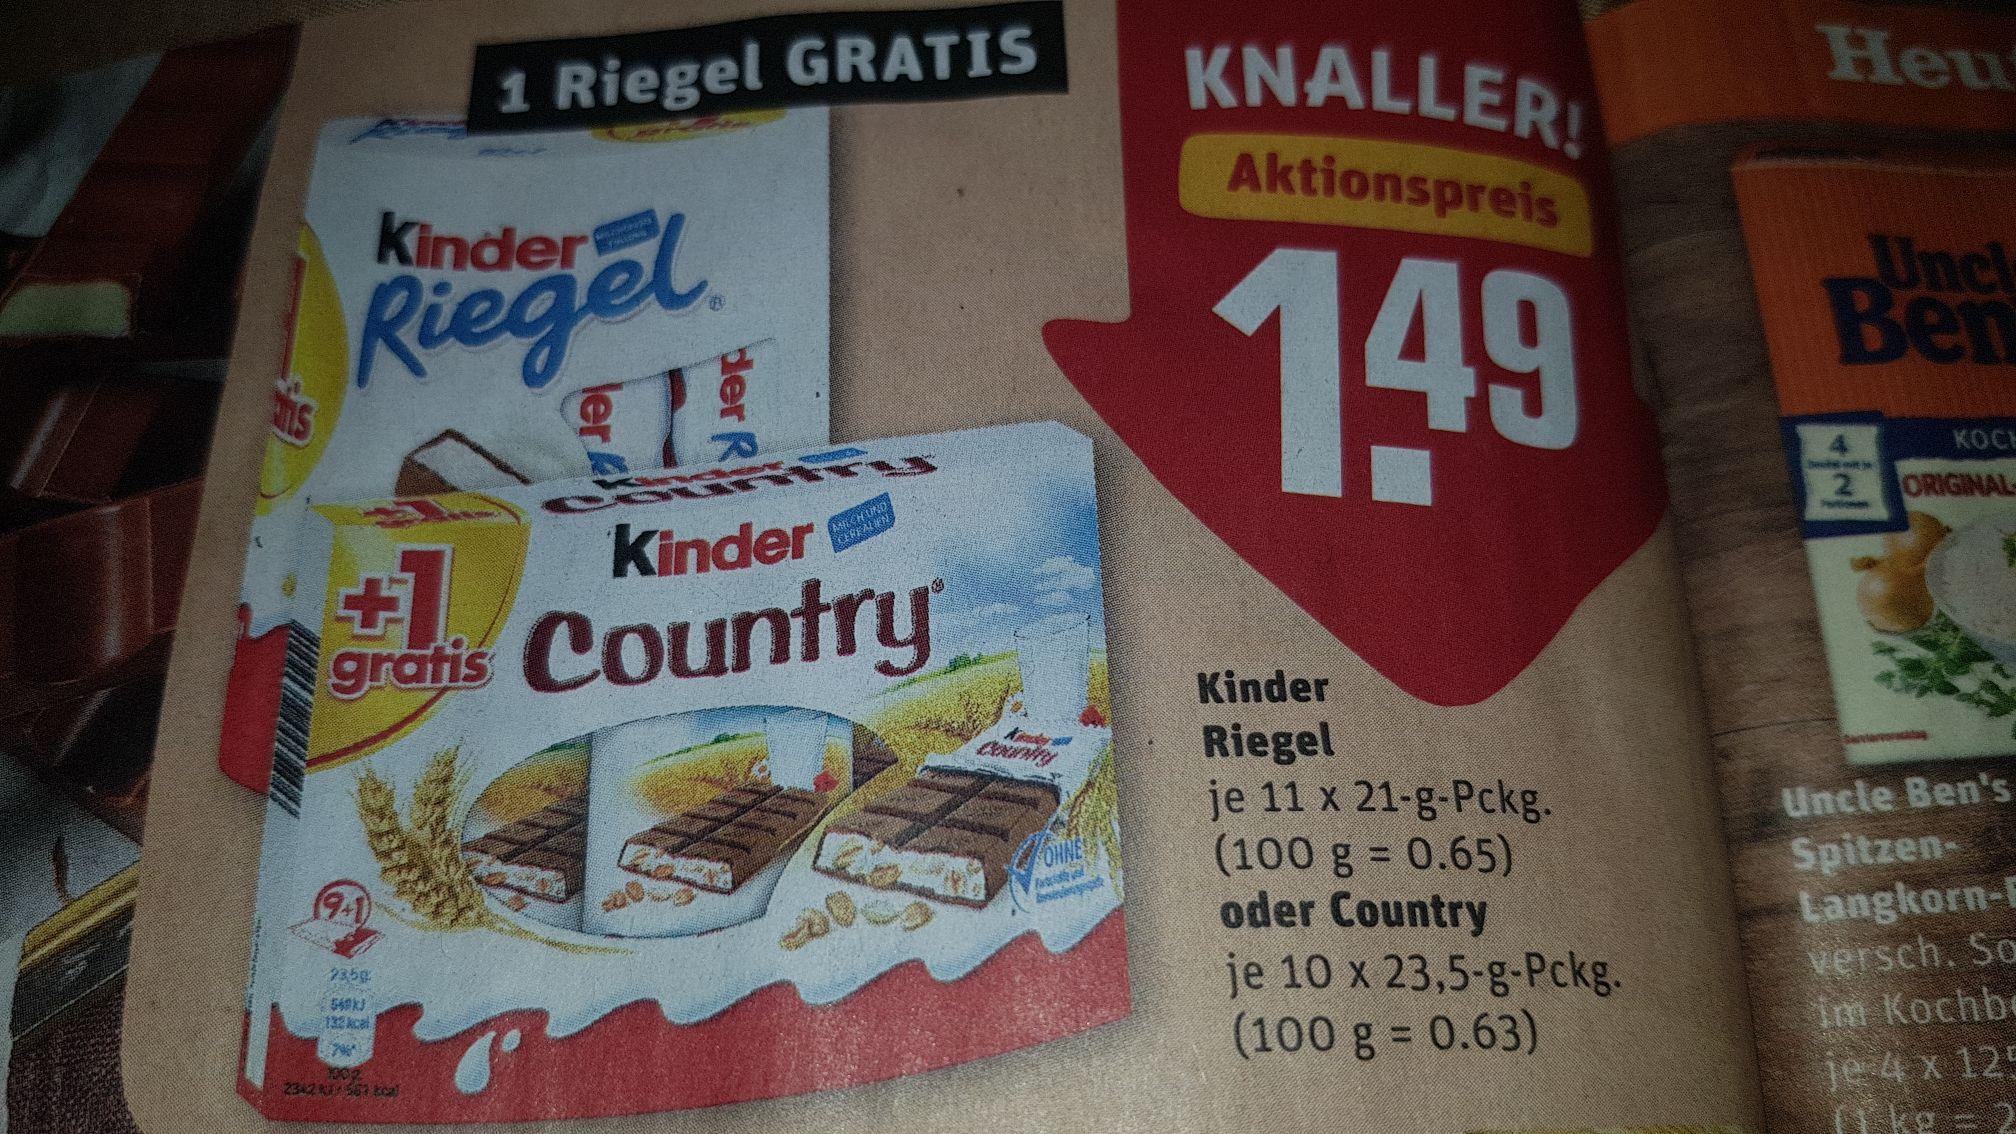 Ferrero Kinder Riegel oder Kinder Country, 1 Riegel gratis